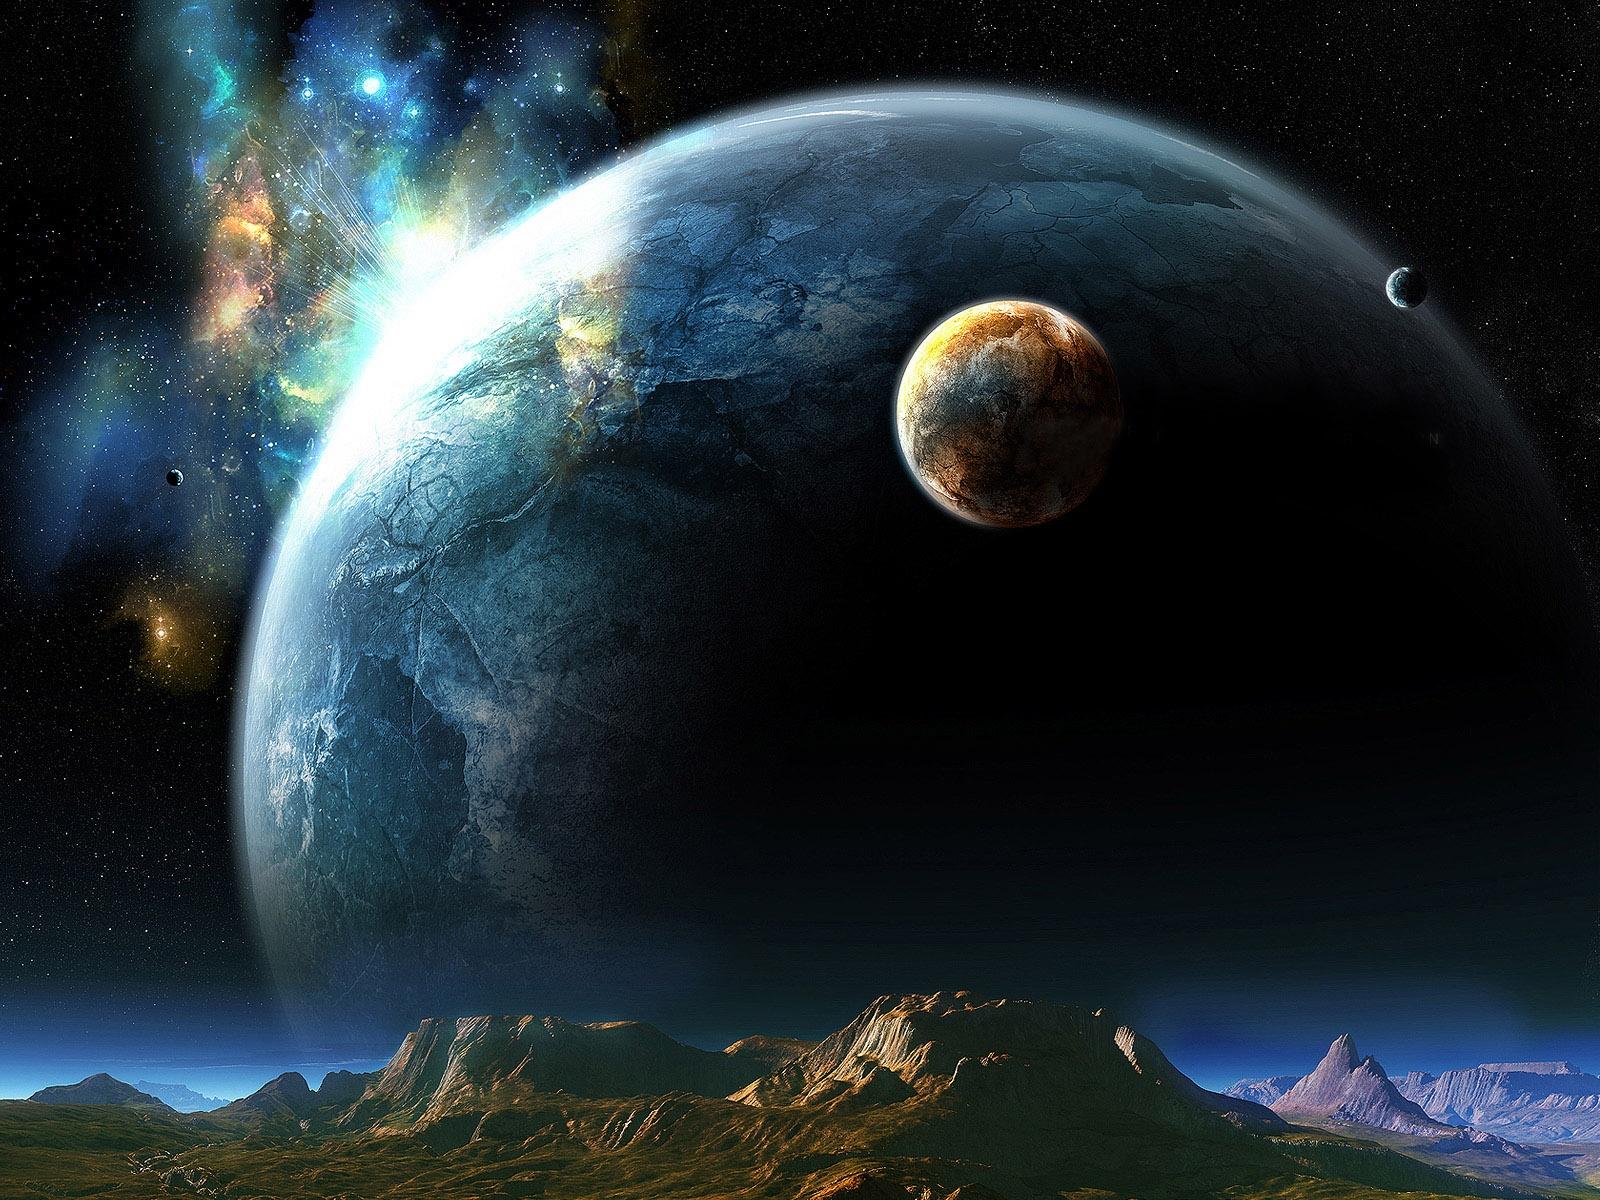 Planeten achtergronden hd wallpapers - Space wallpaper large ...